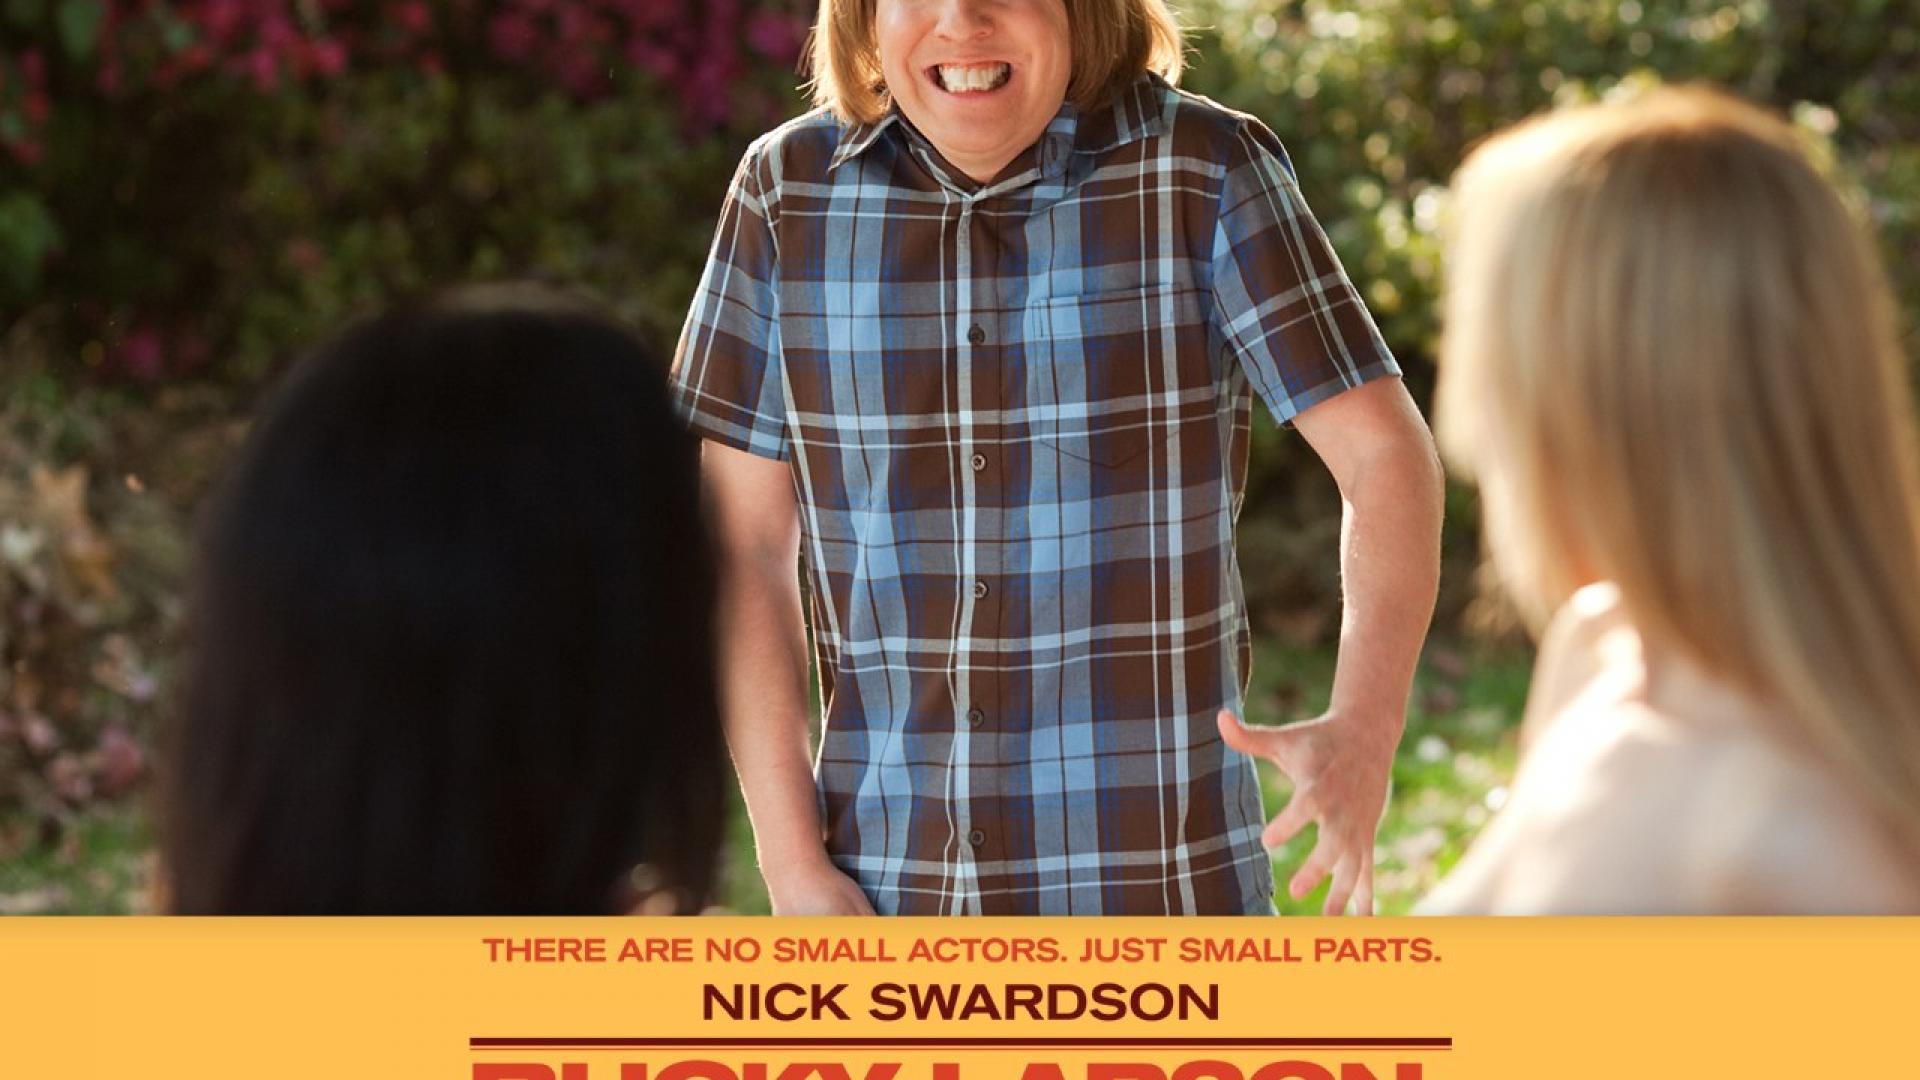 Nick Swardson in Bucky Larson Born to Be a Star HD Wallpaper wallpaper 1920x1080